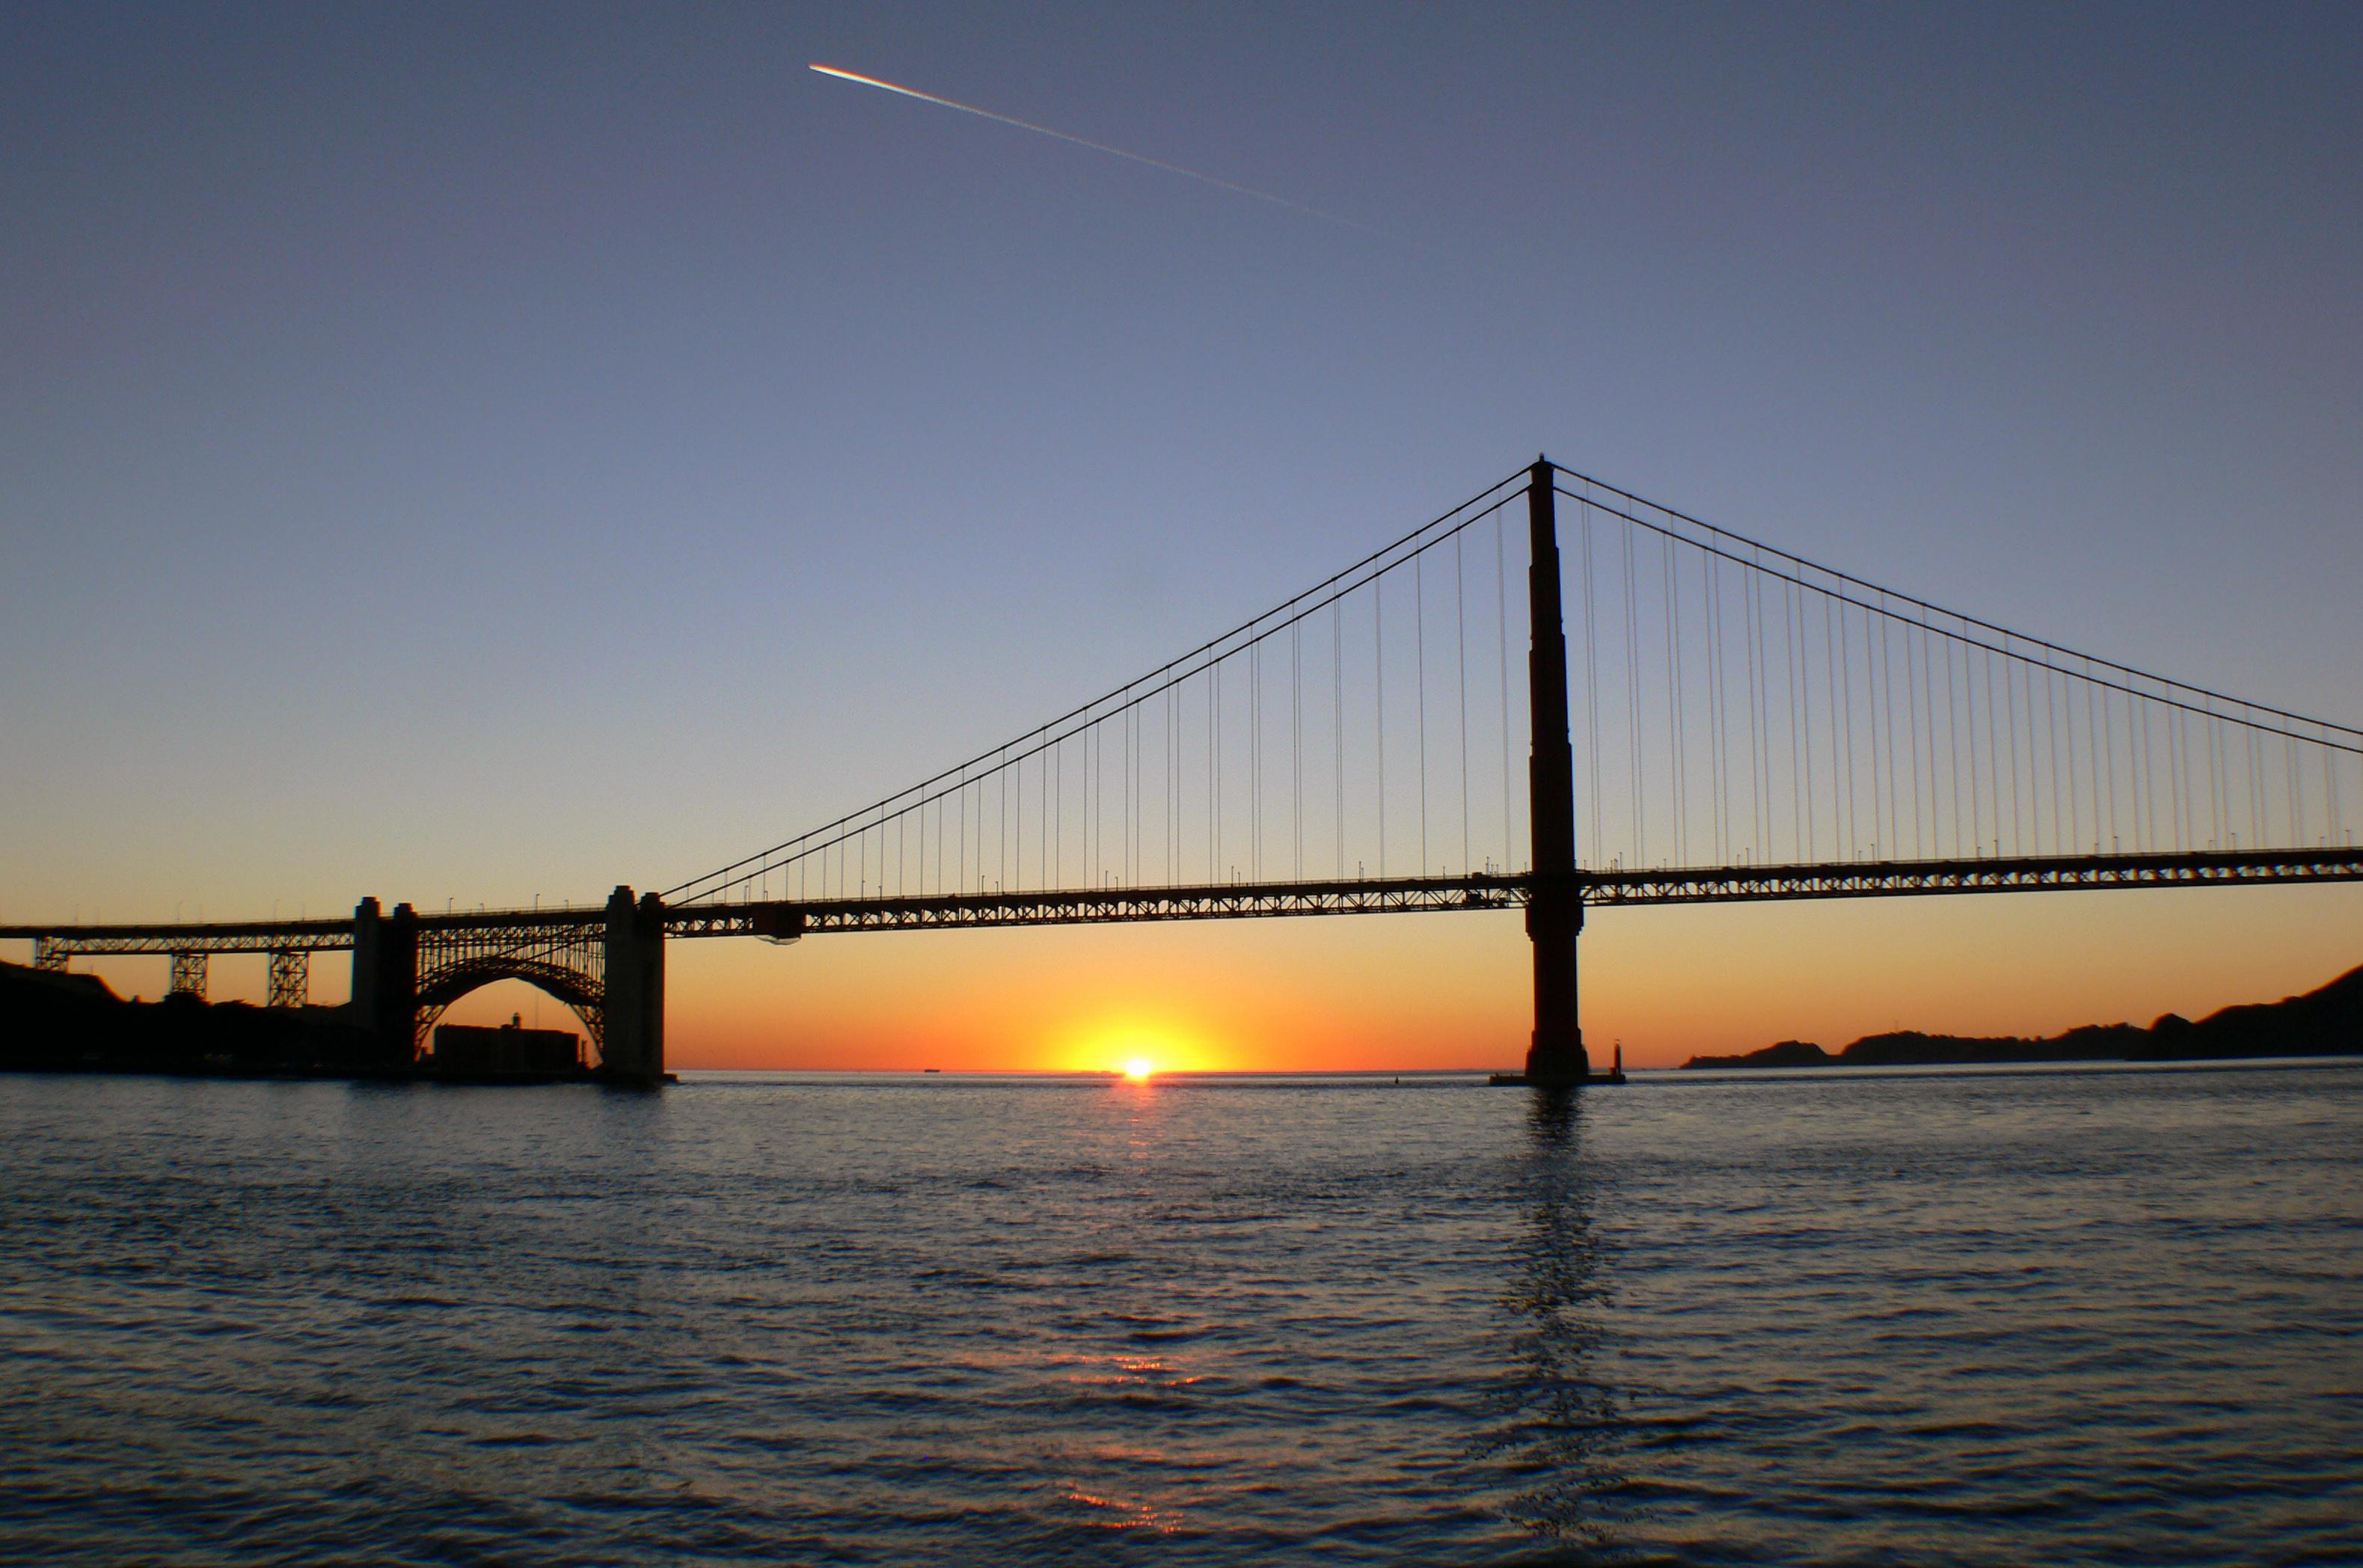 San Francisco Bay (21), Bay, Bridge, Dusk, Free photos, HQ Photo